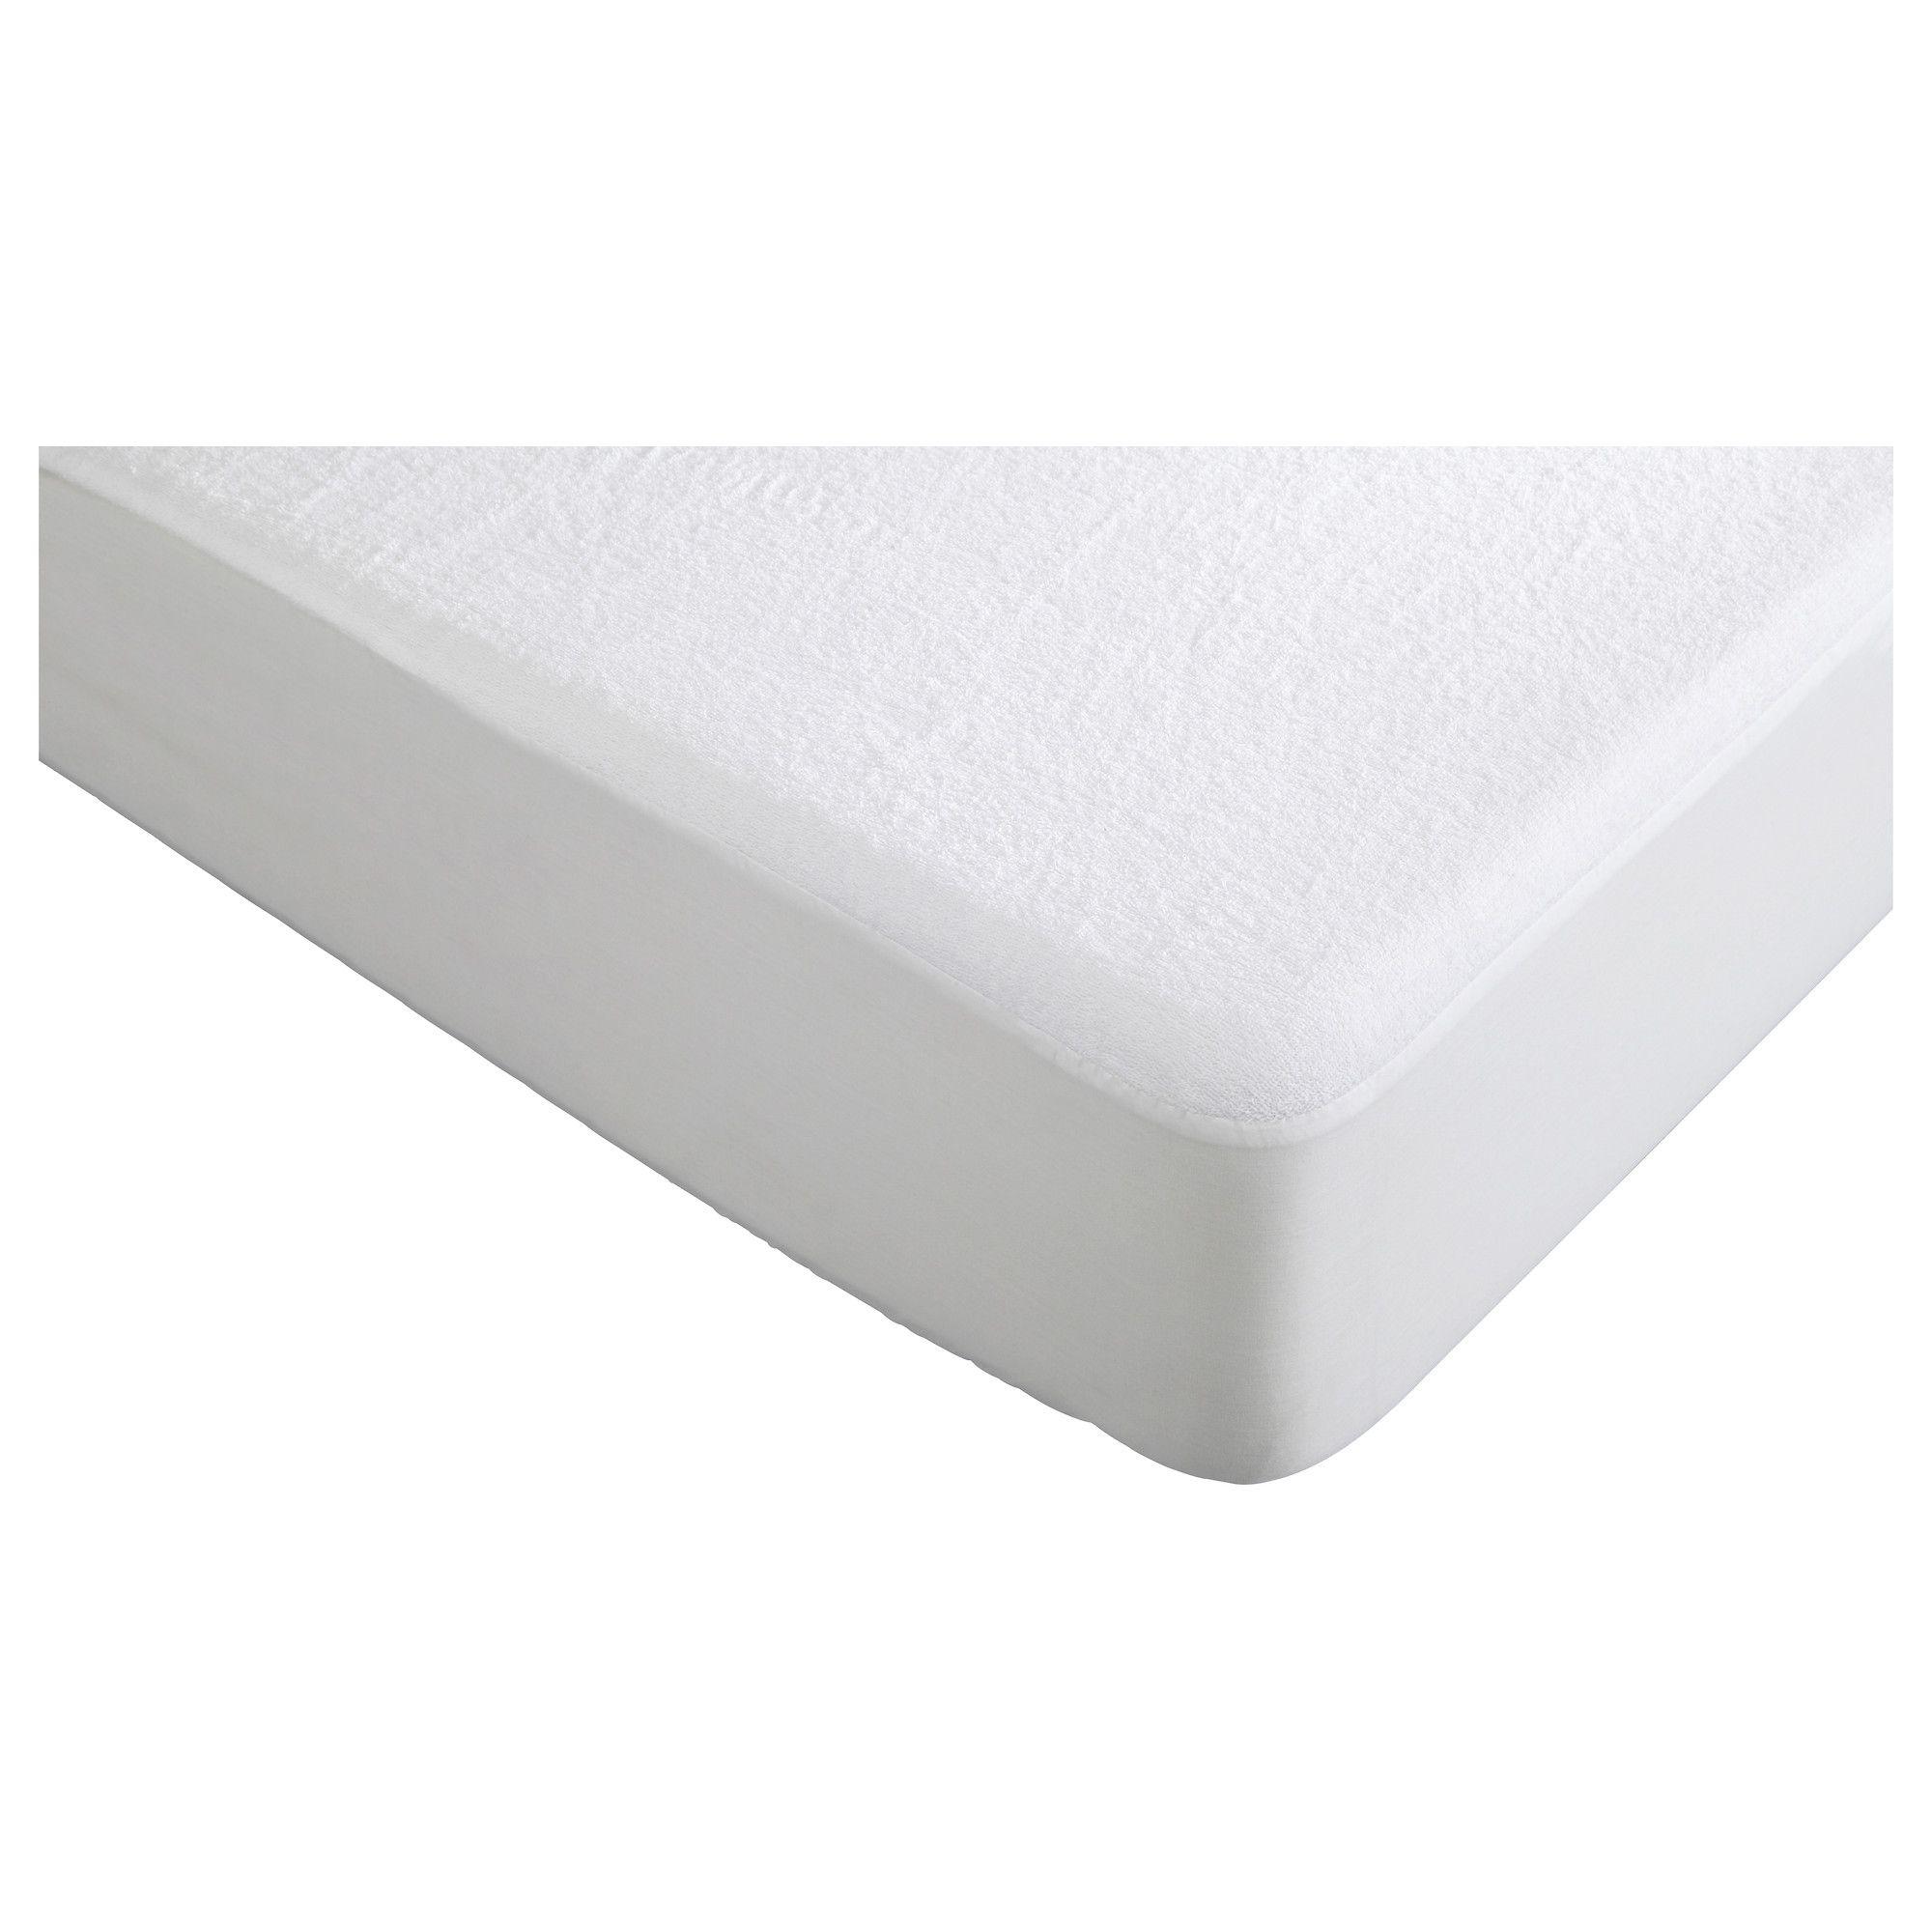 Ikea Us Furniture And Home Furnishings Mattress Protector